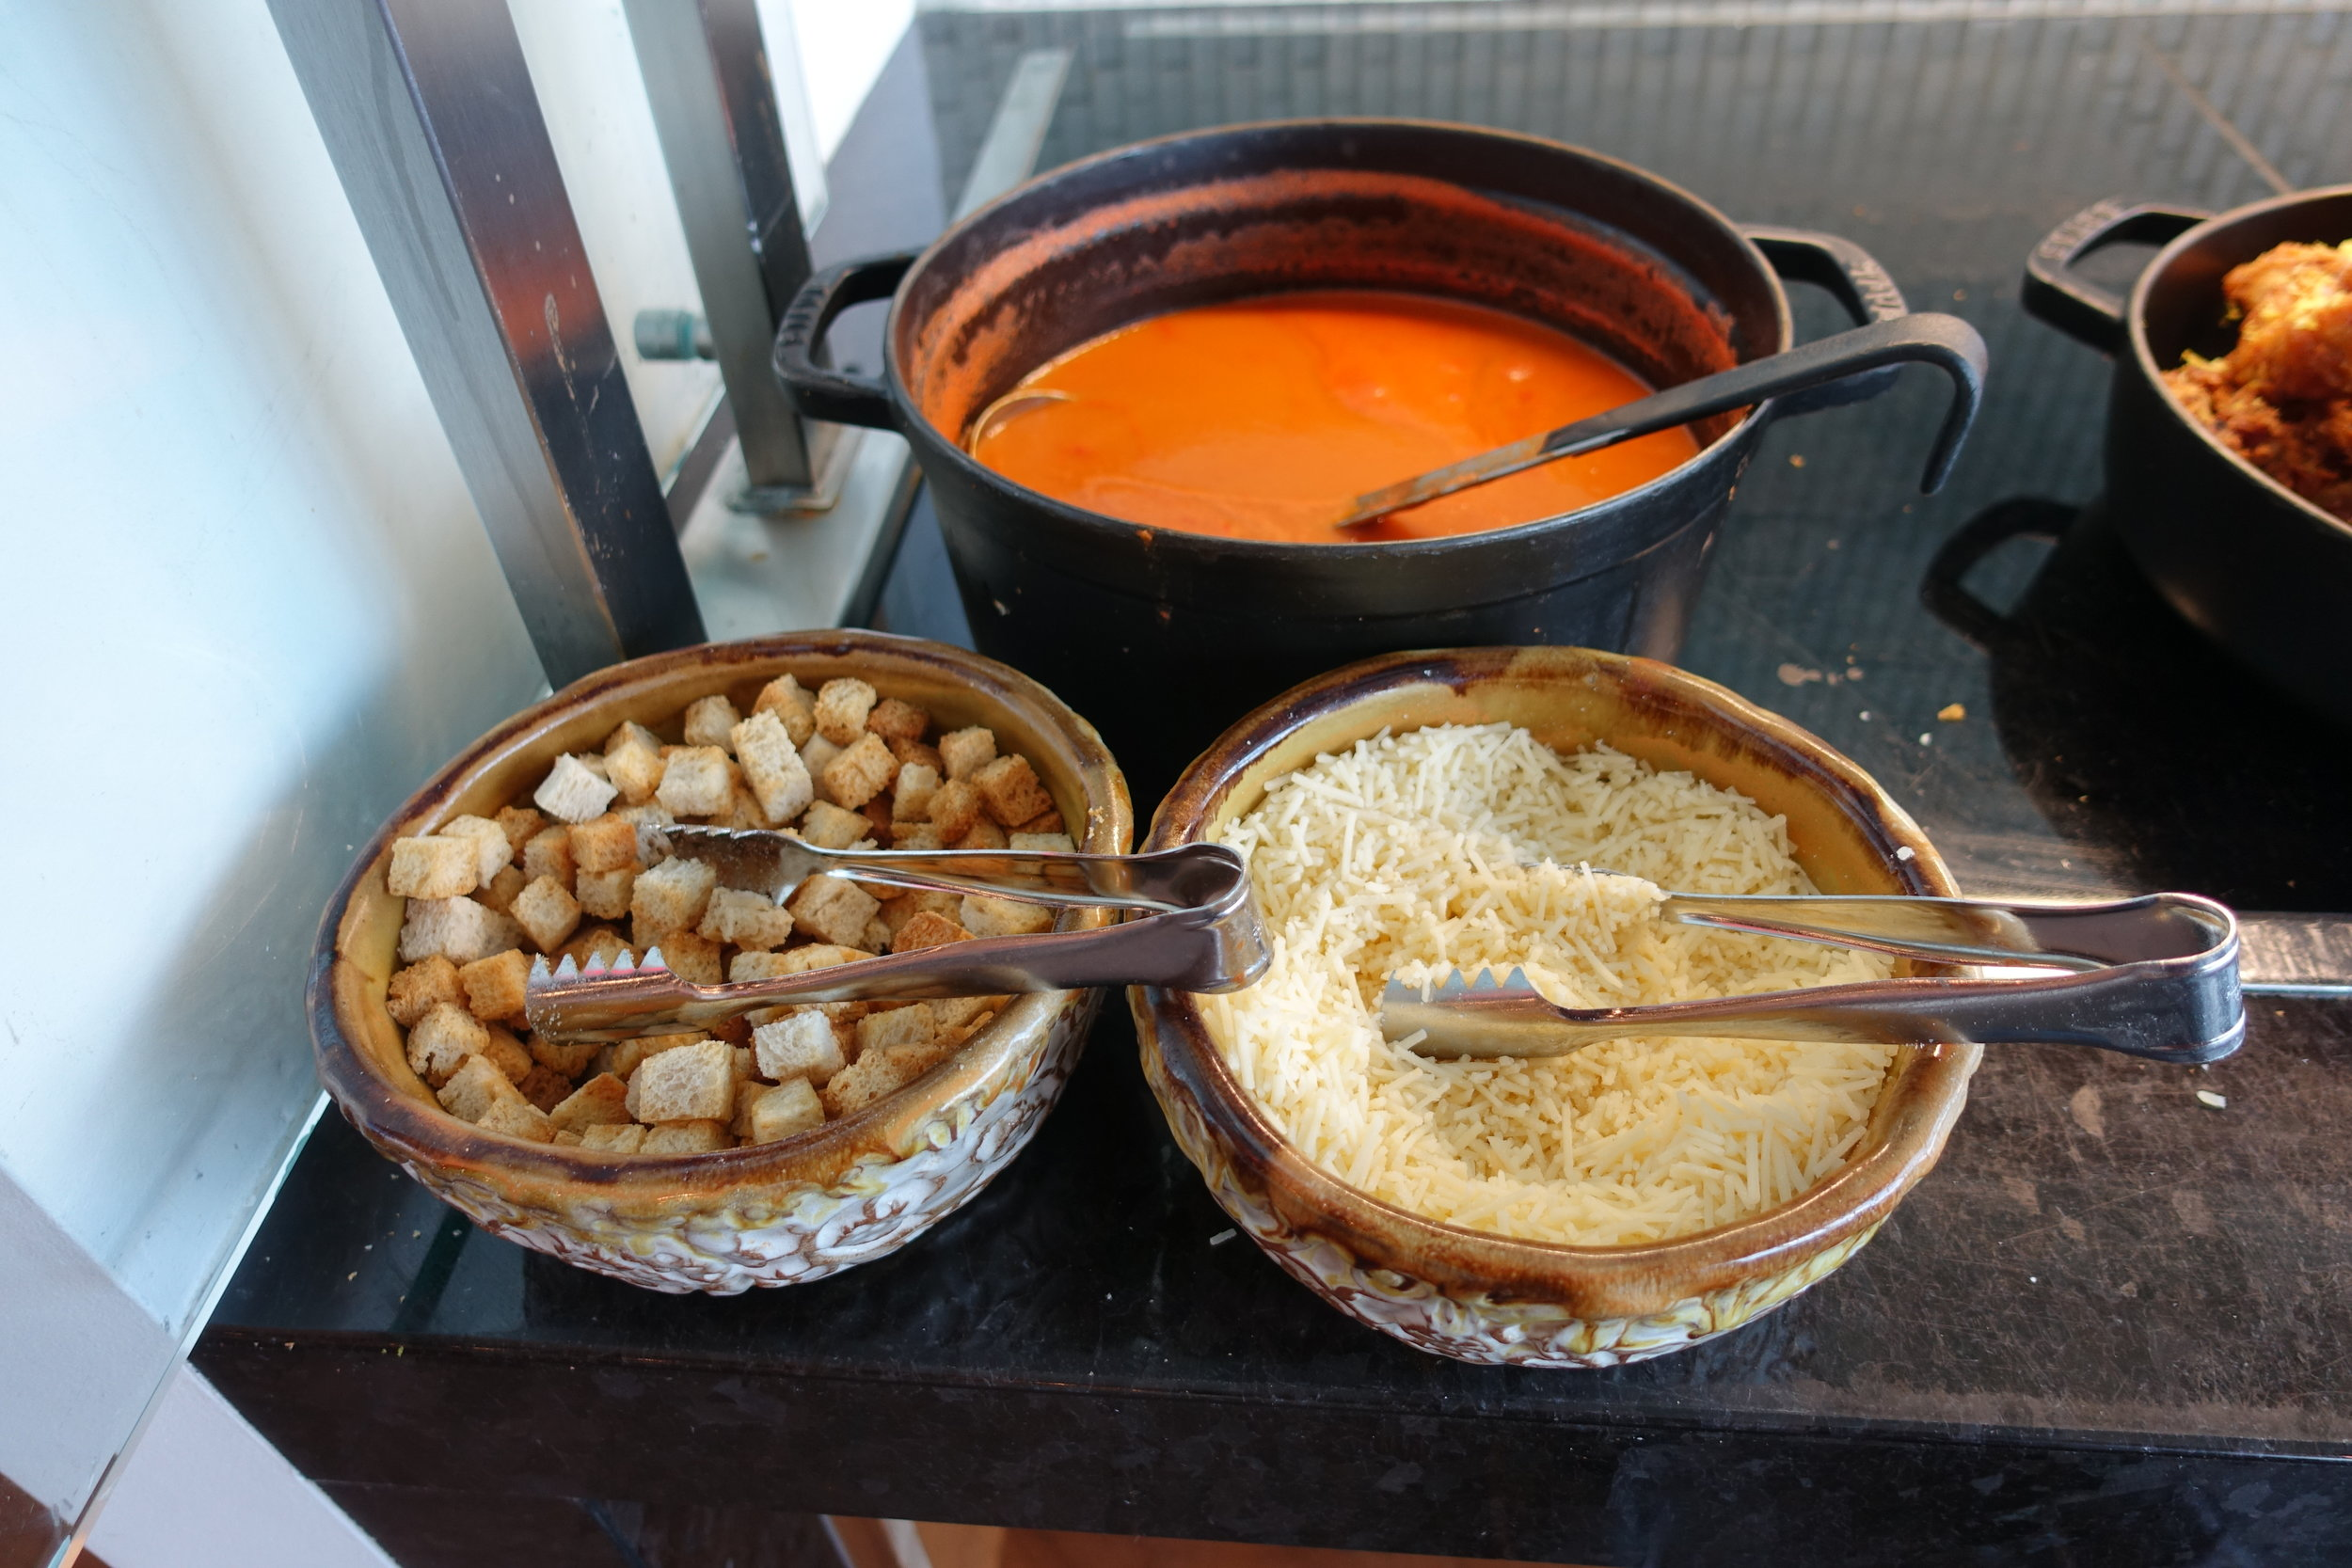 Tomato bisque station